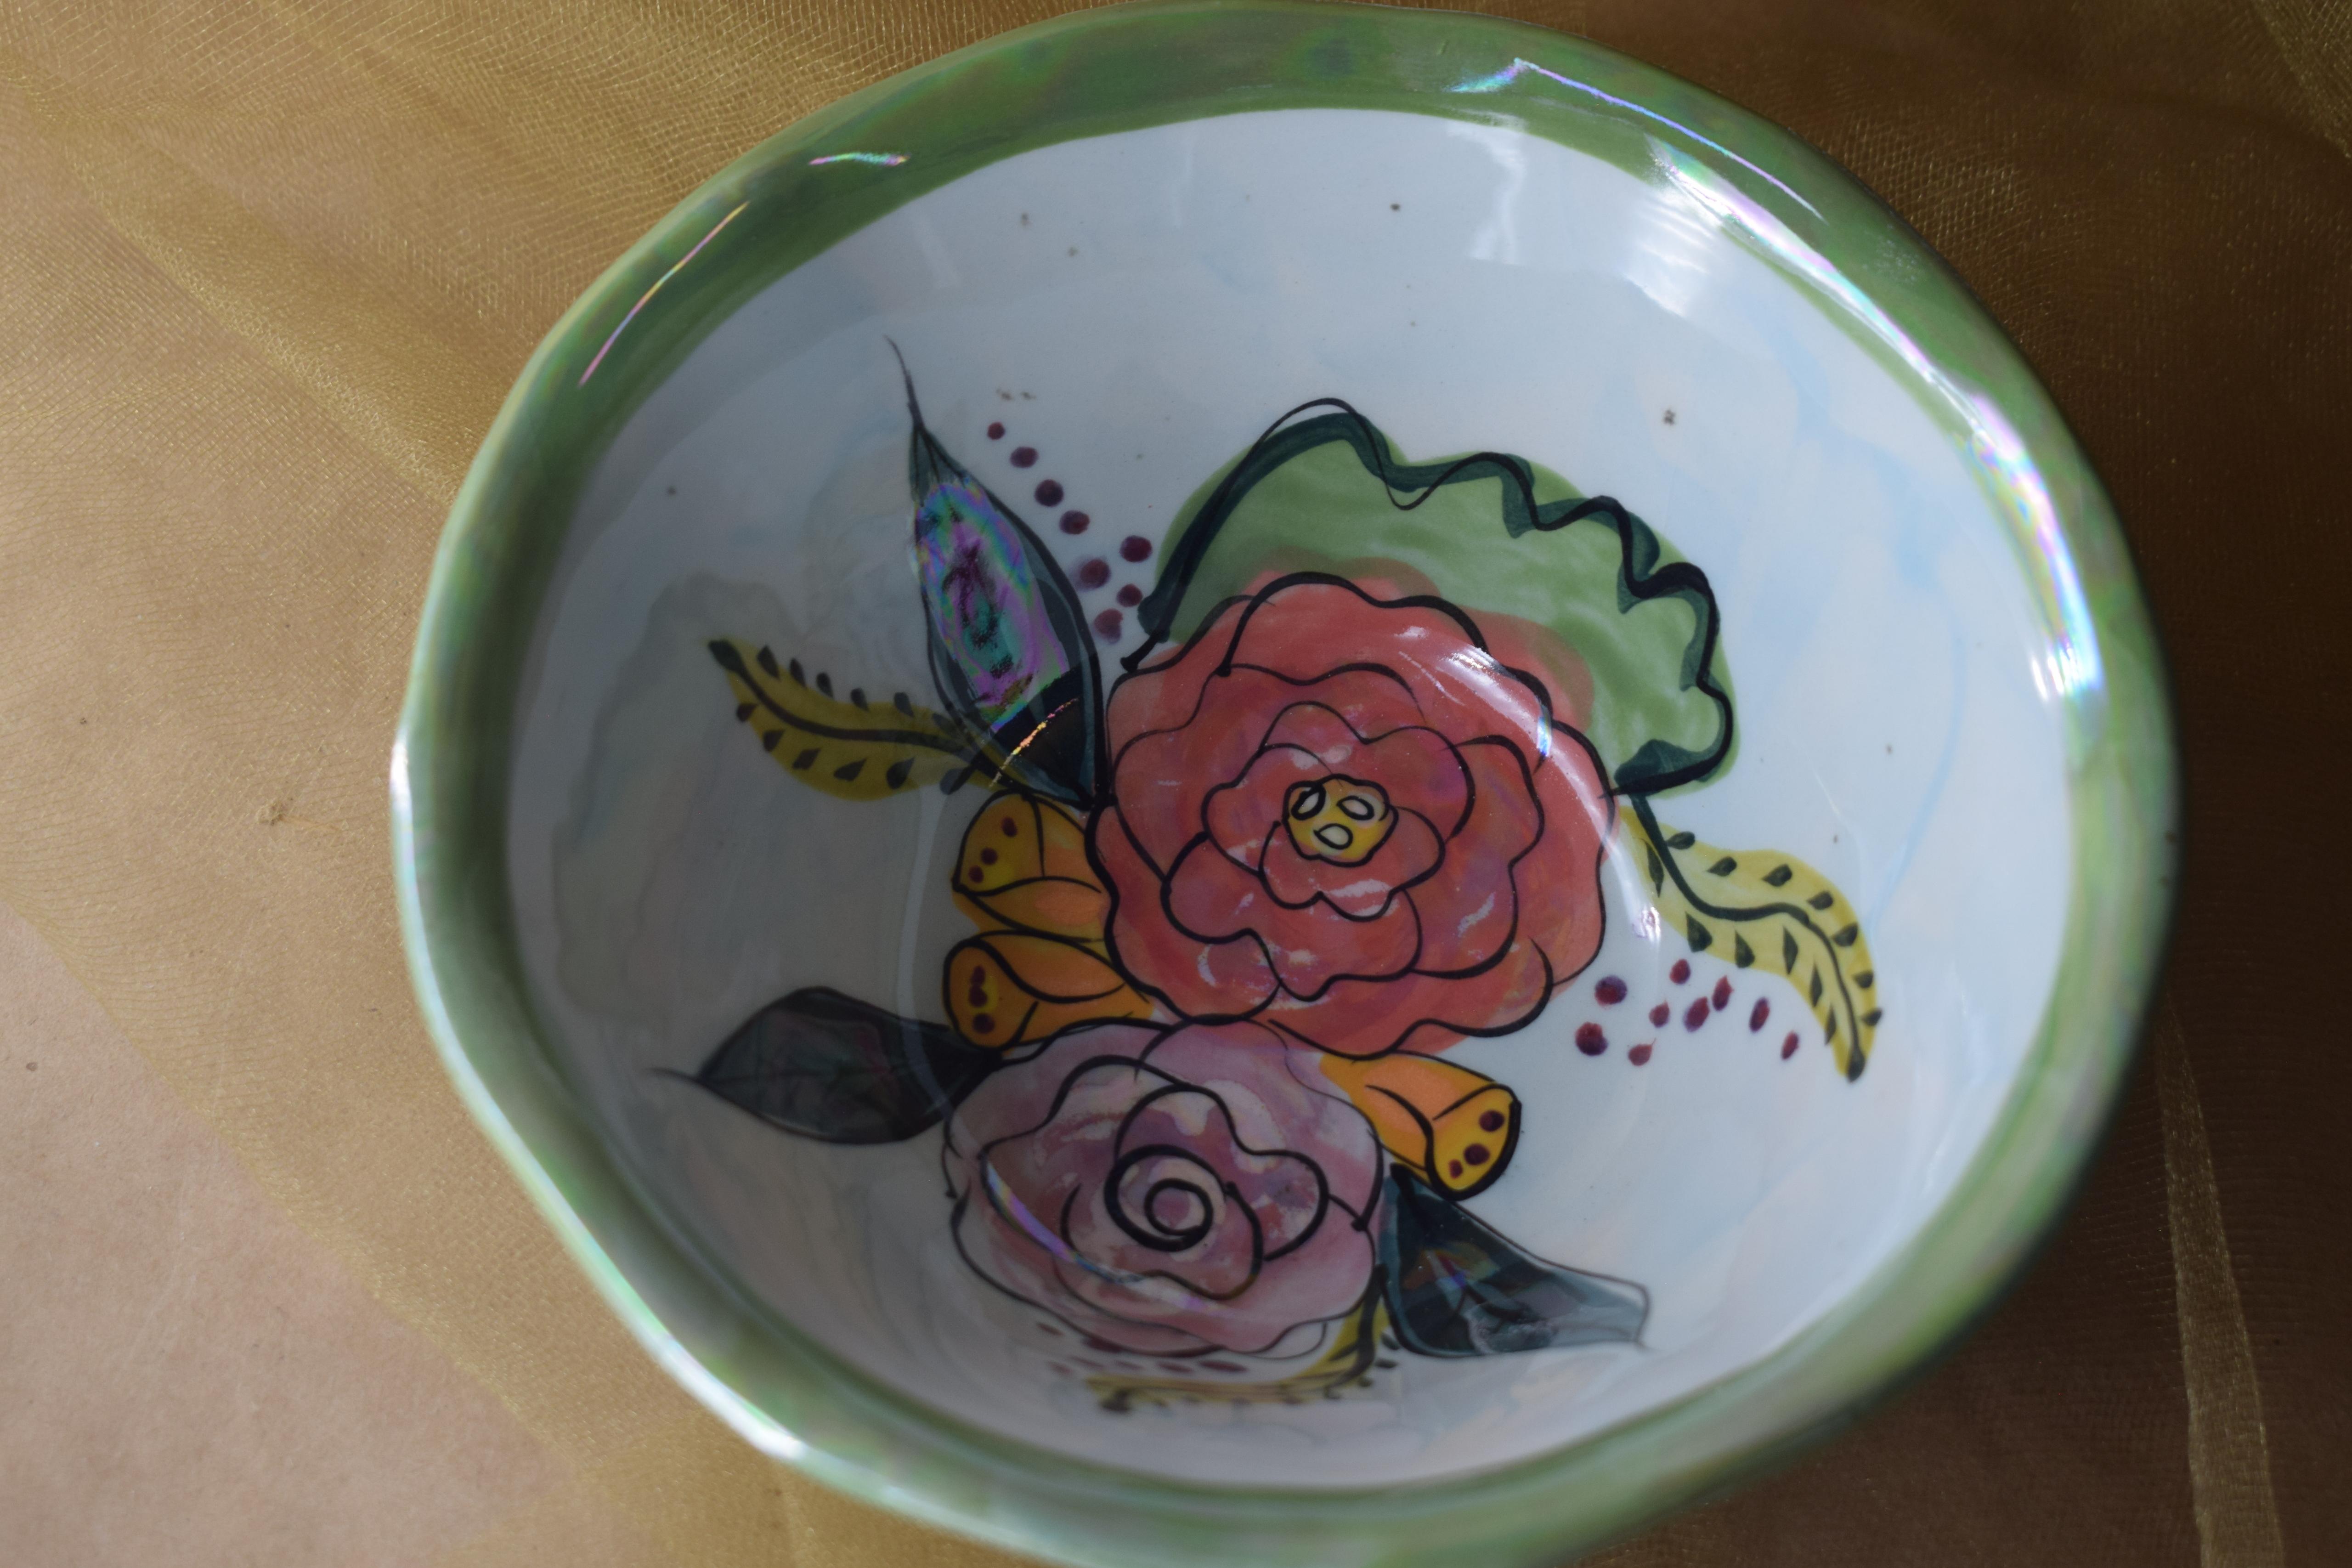 (DCB06-JF) Deep Cereal Bowl- Jenna Floral